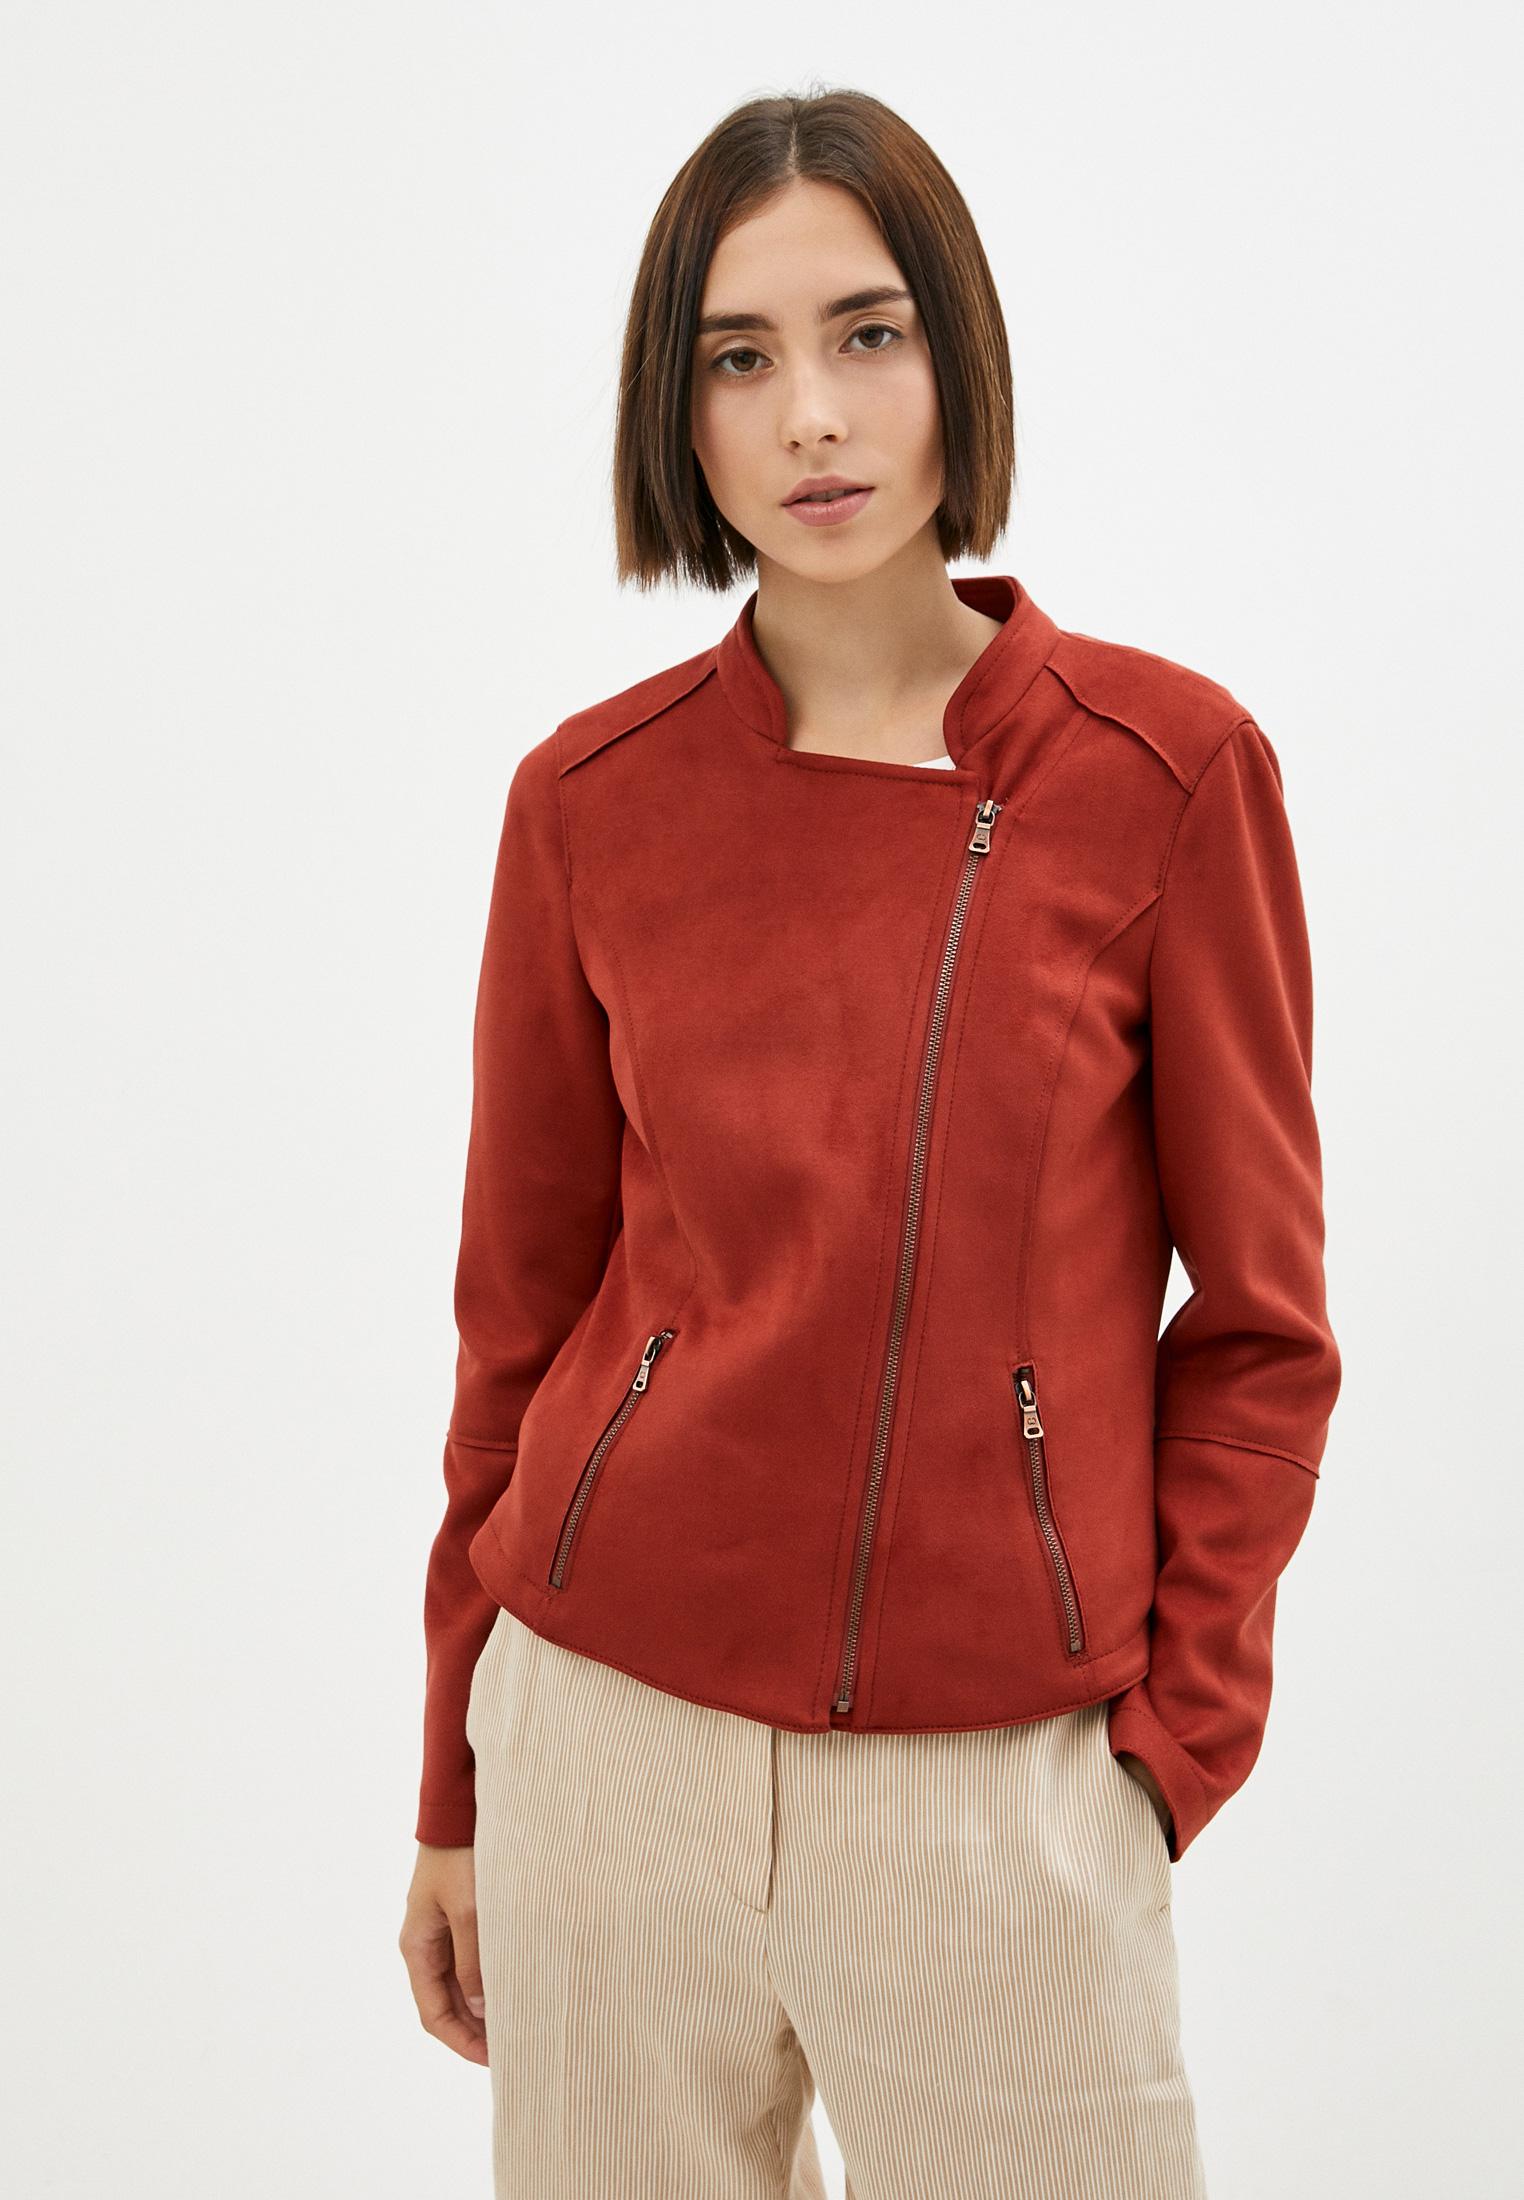 Кожаная куртка Gerry Weber (Гарри Вебер) Куртка кожаная Gerry Weber